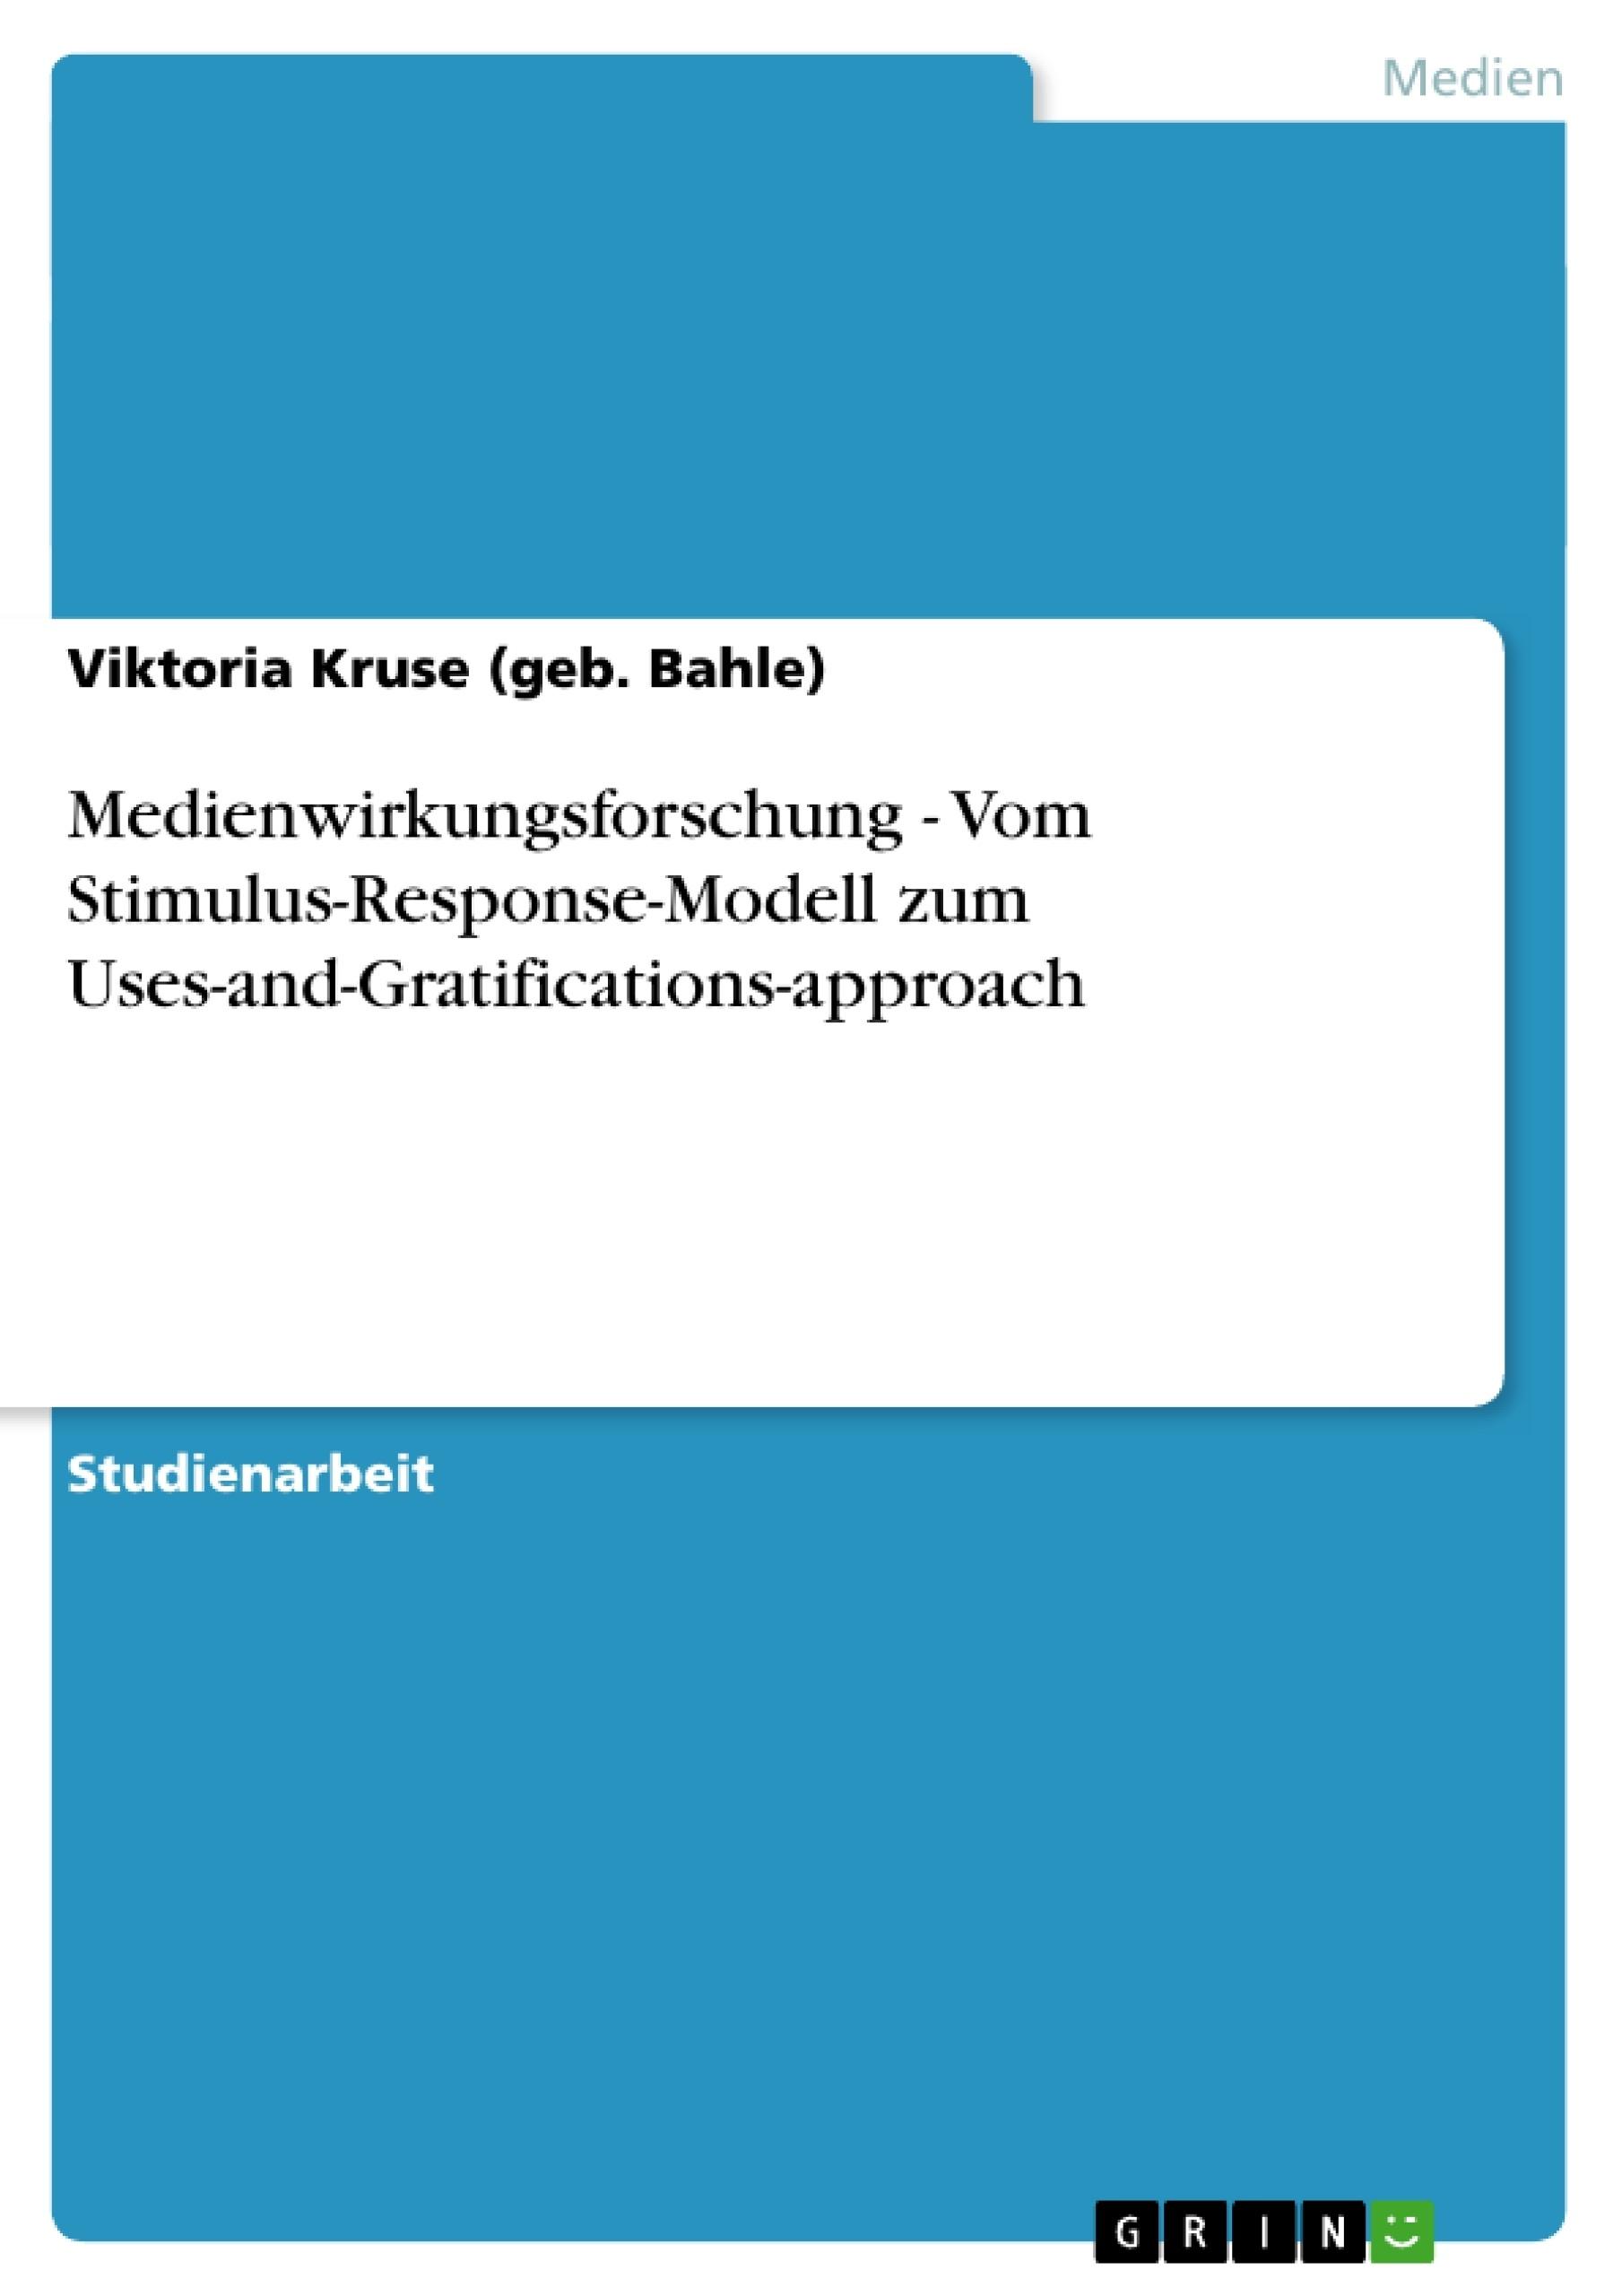 Titel: Medienwirkungsforschung - Vom Stimulus-Response-Modell zum Uses-and-Gratifications-approach